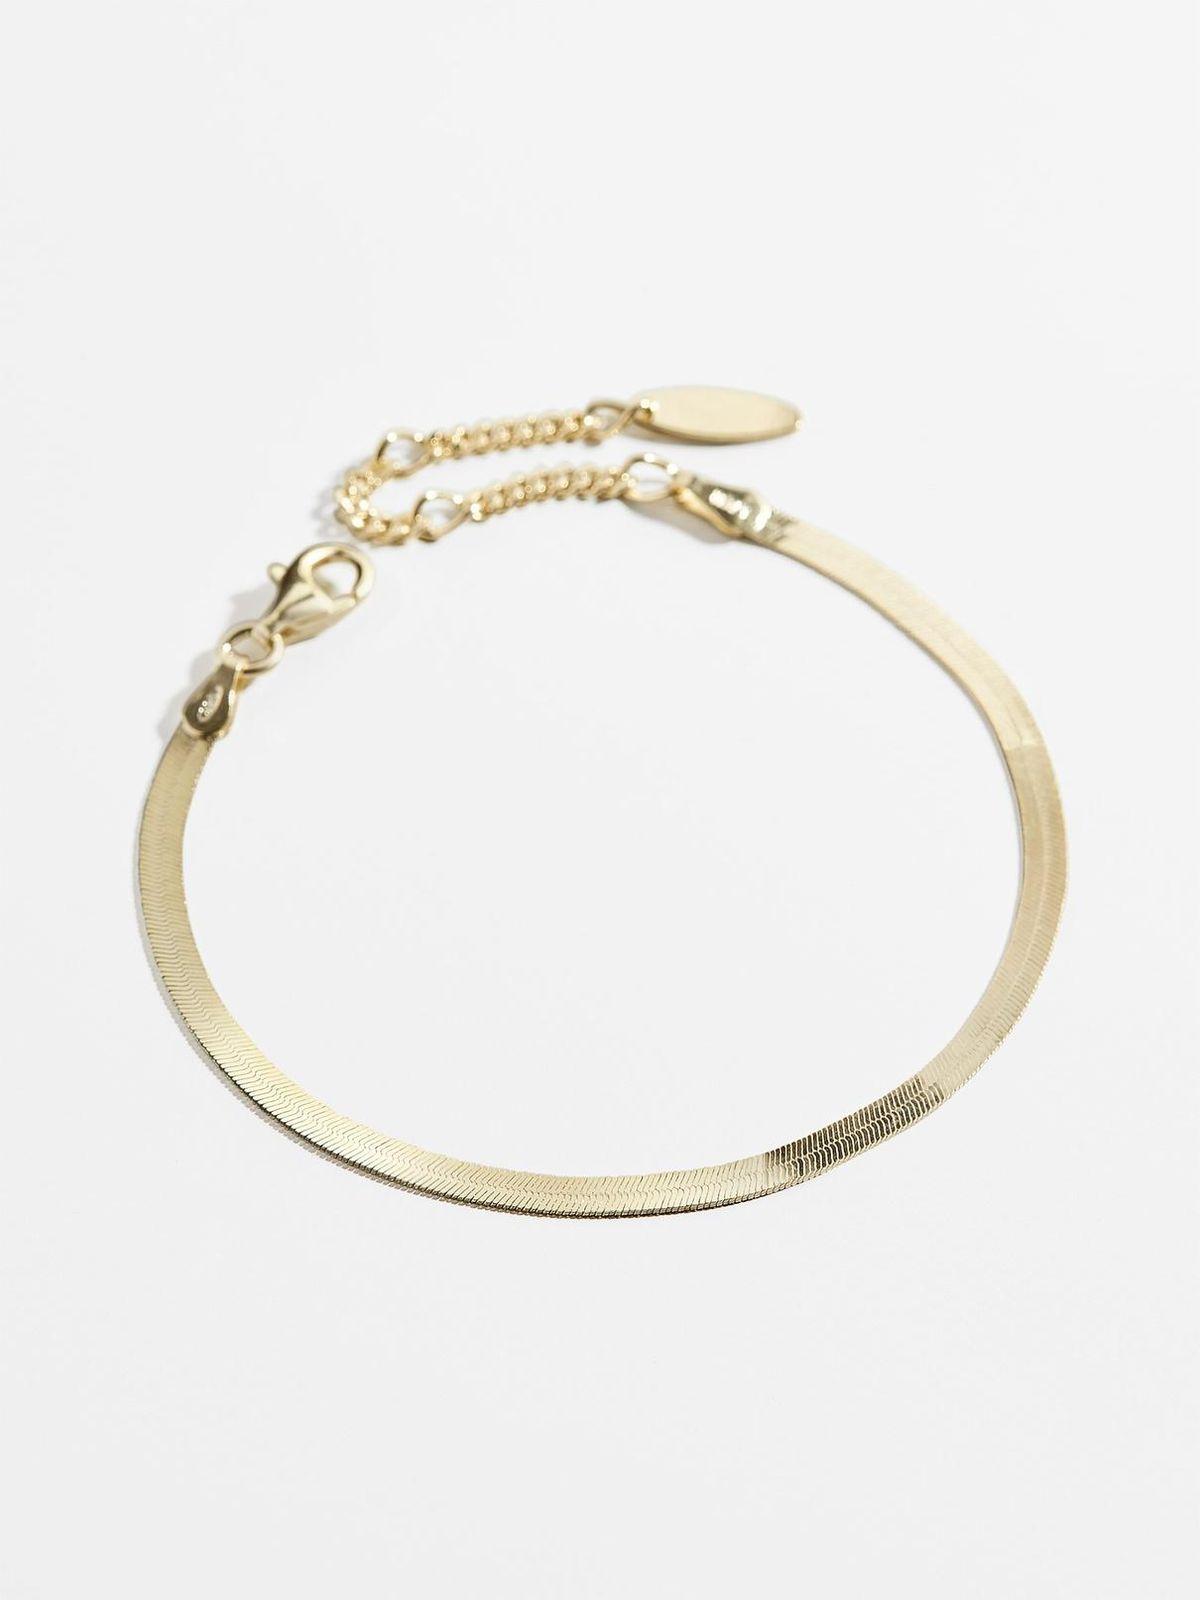 baublebar gia bracelet